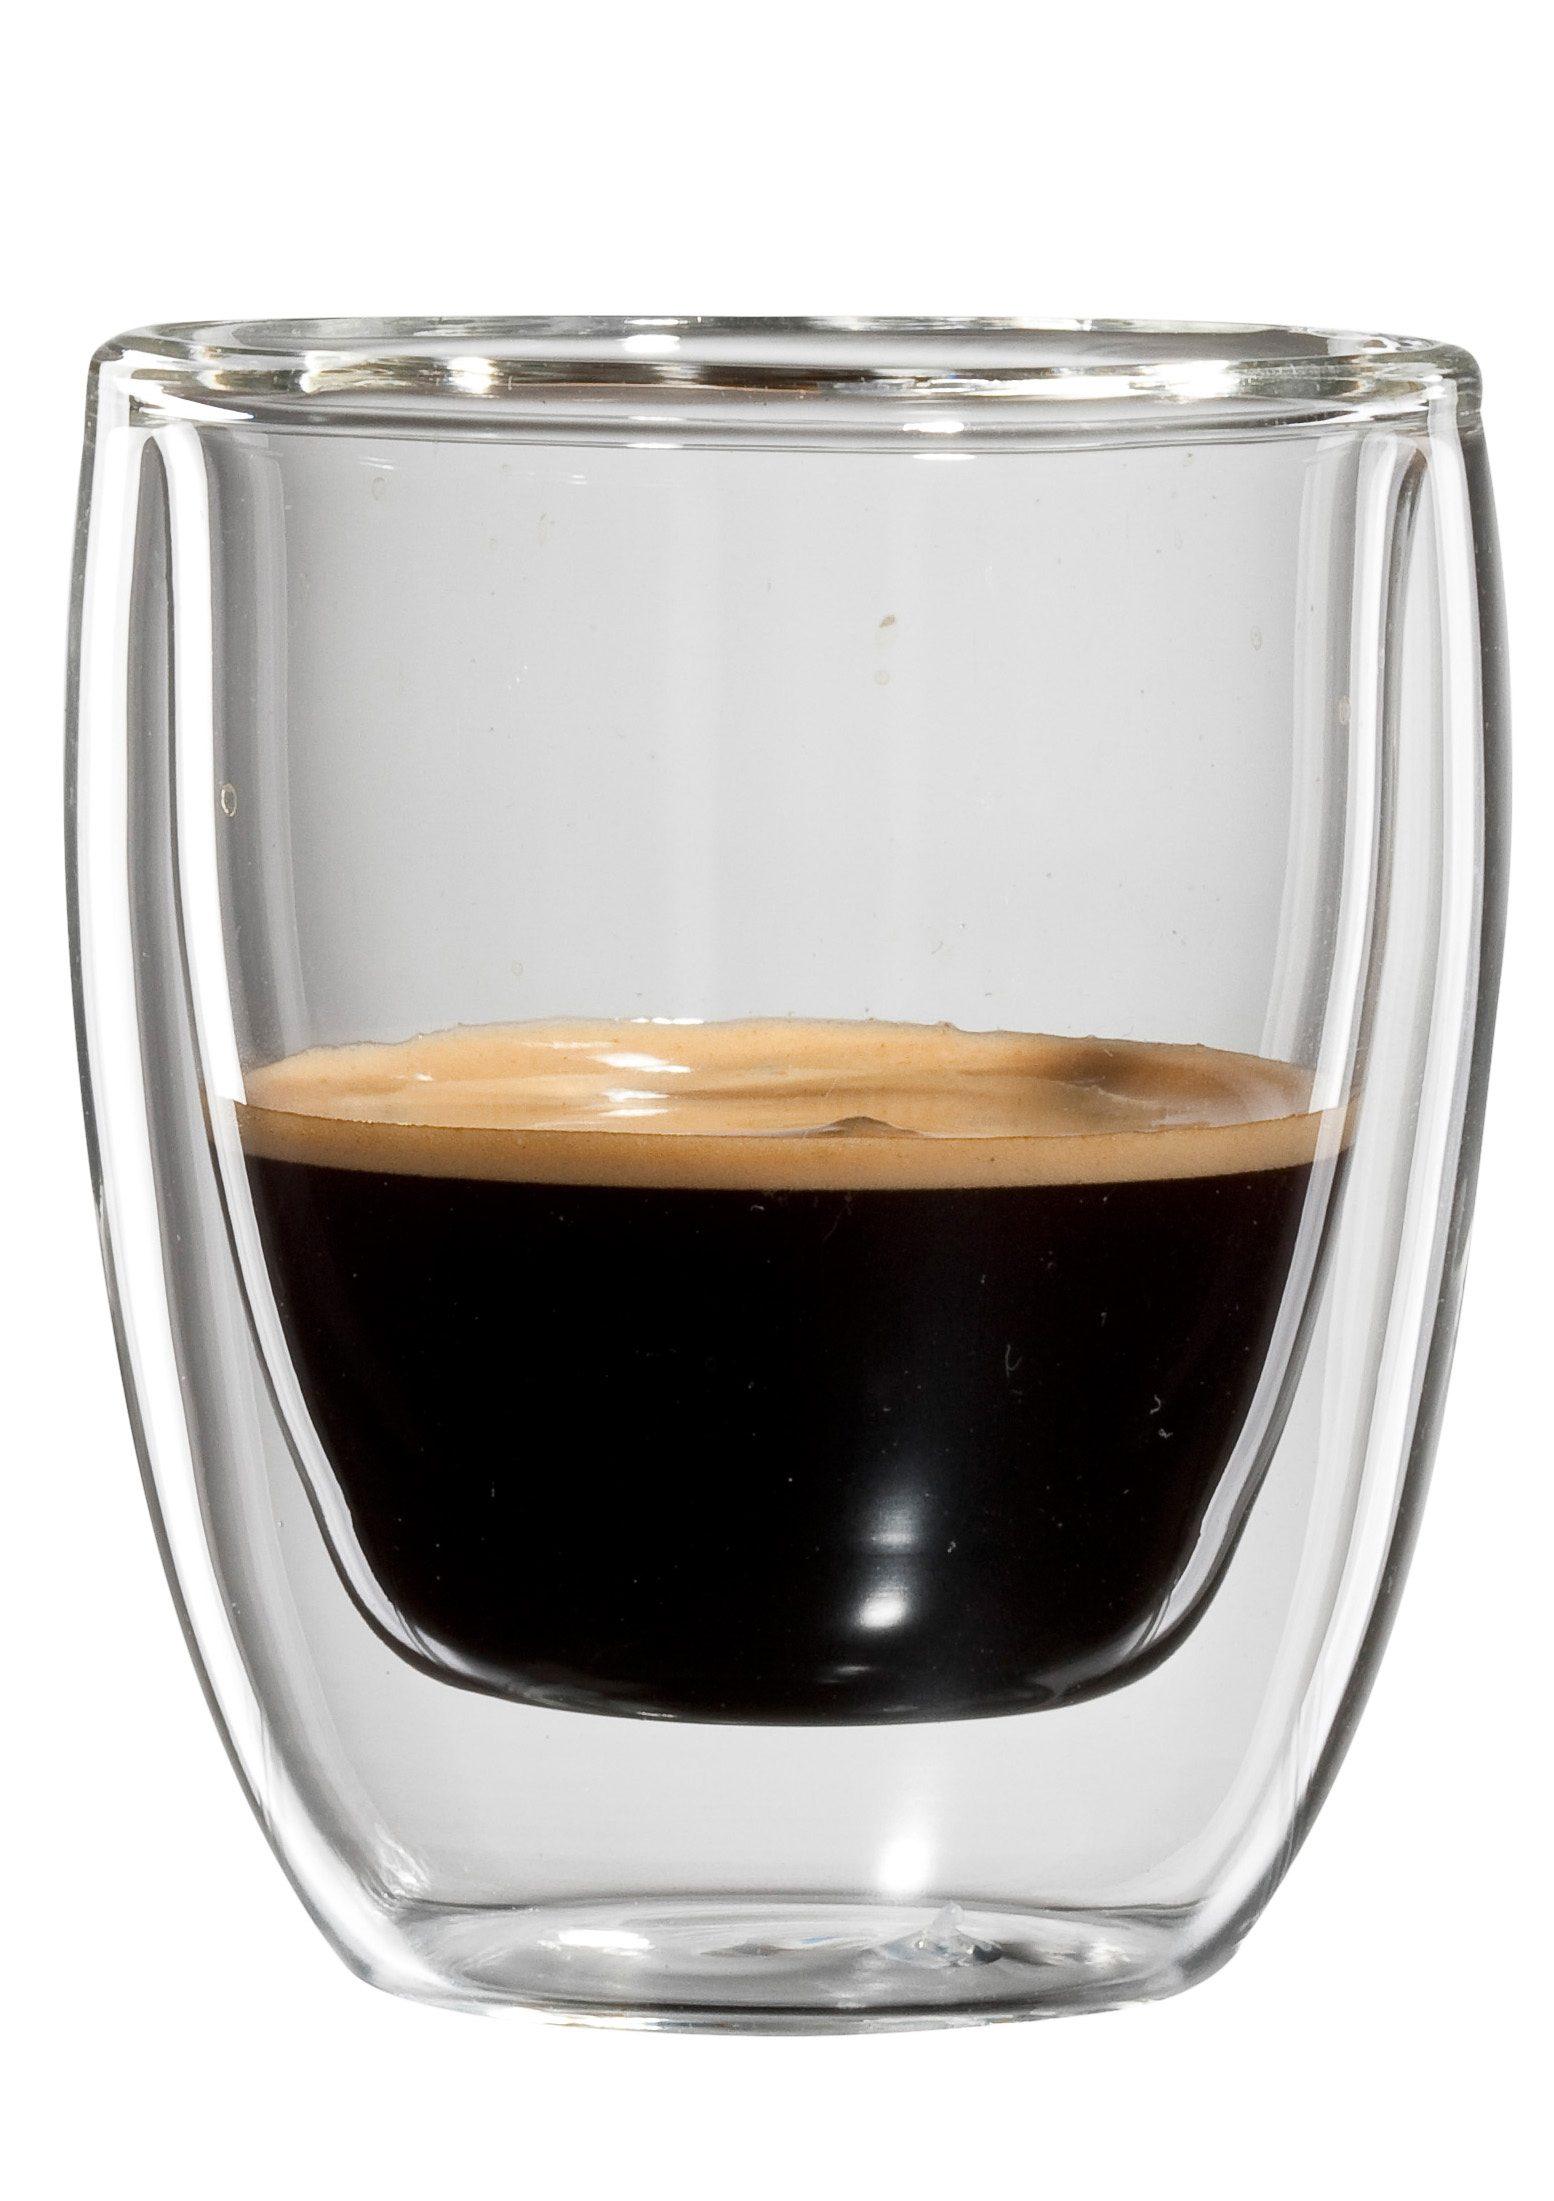 bloomix Espresso-Glas, 4er Set, doppelwandig, »Roma«, 80 ml